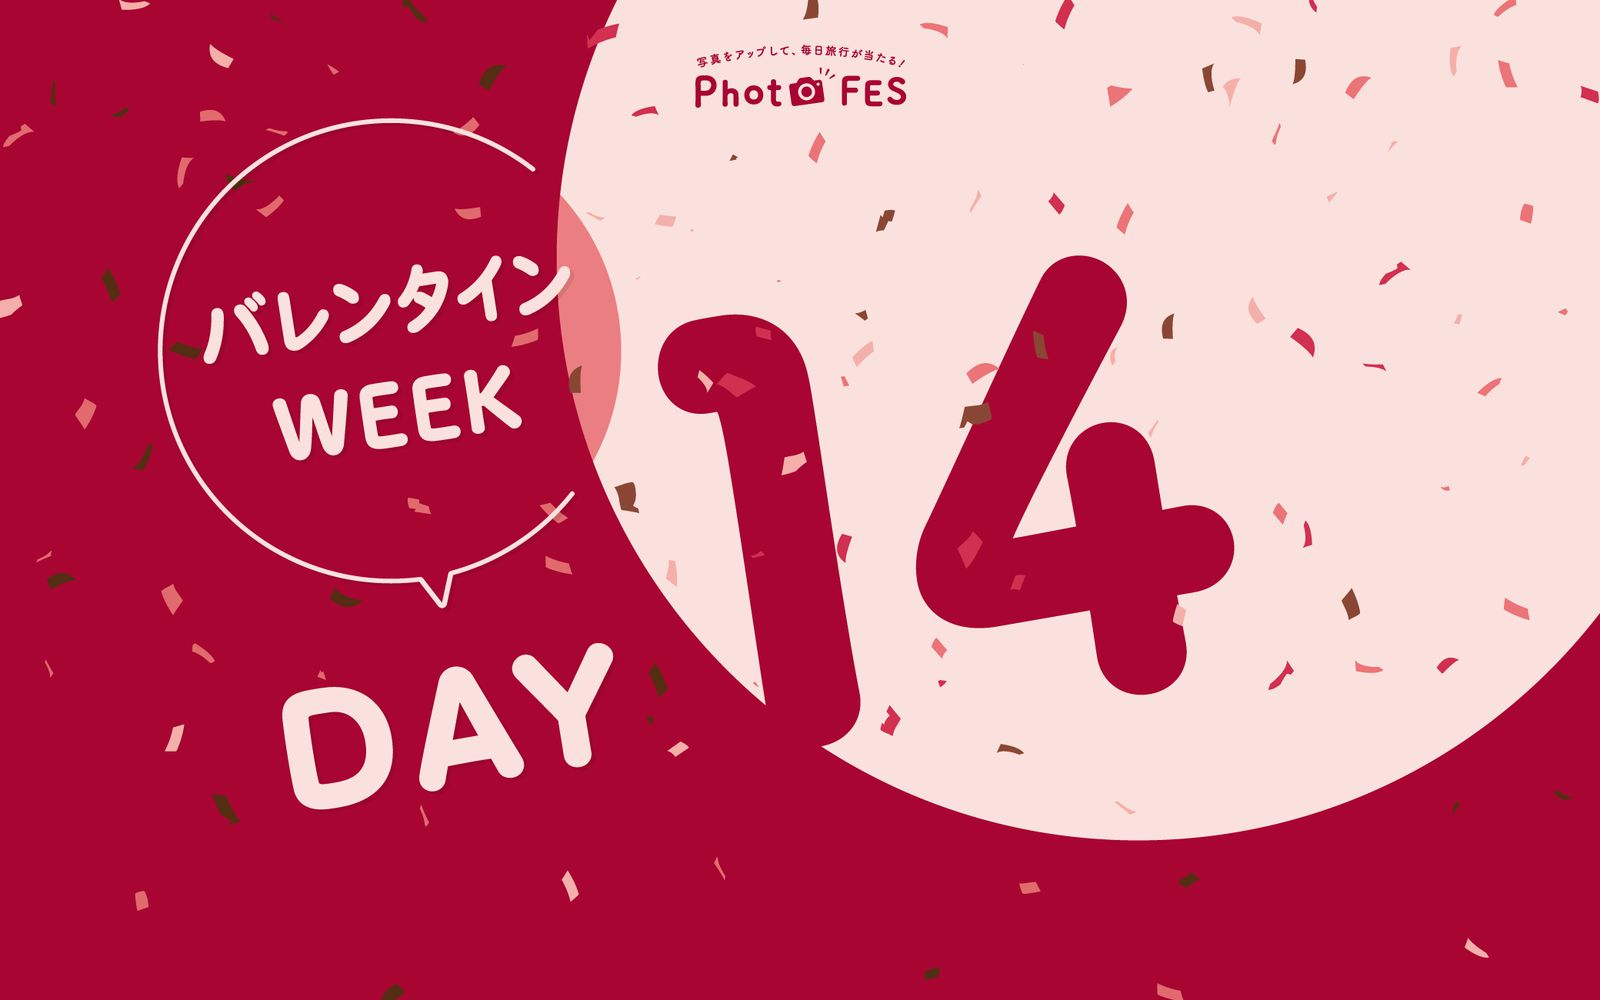 【DAY14】「Photo FES バレンタインWEEK」2月14日投稿分であたる賞品&受賞者発表